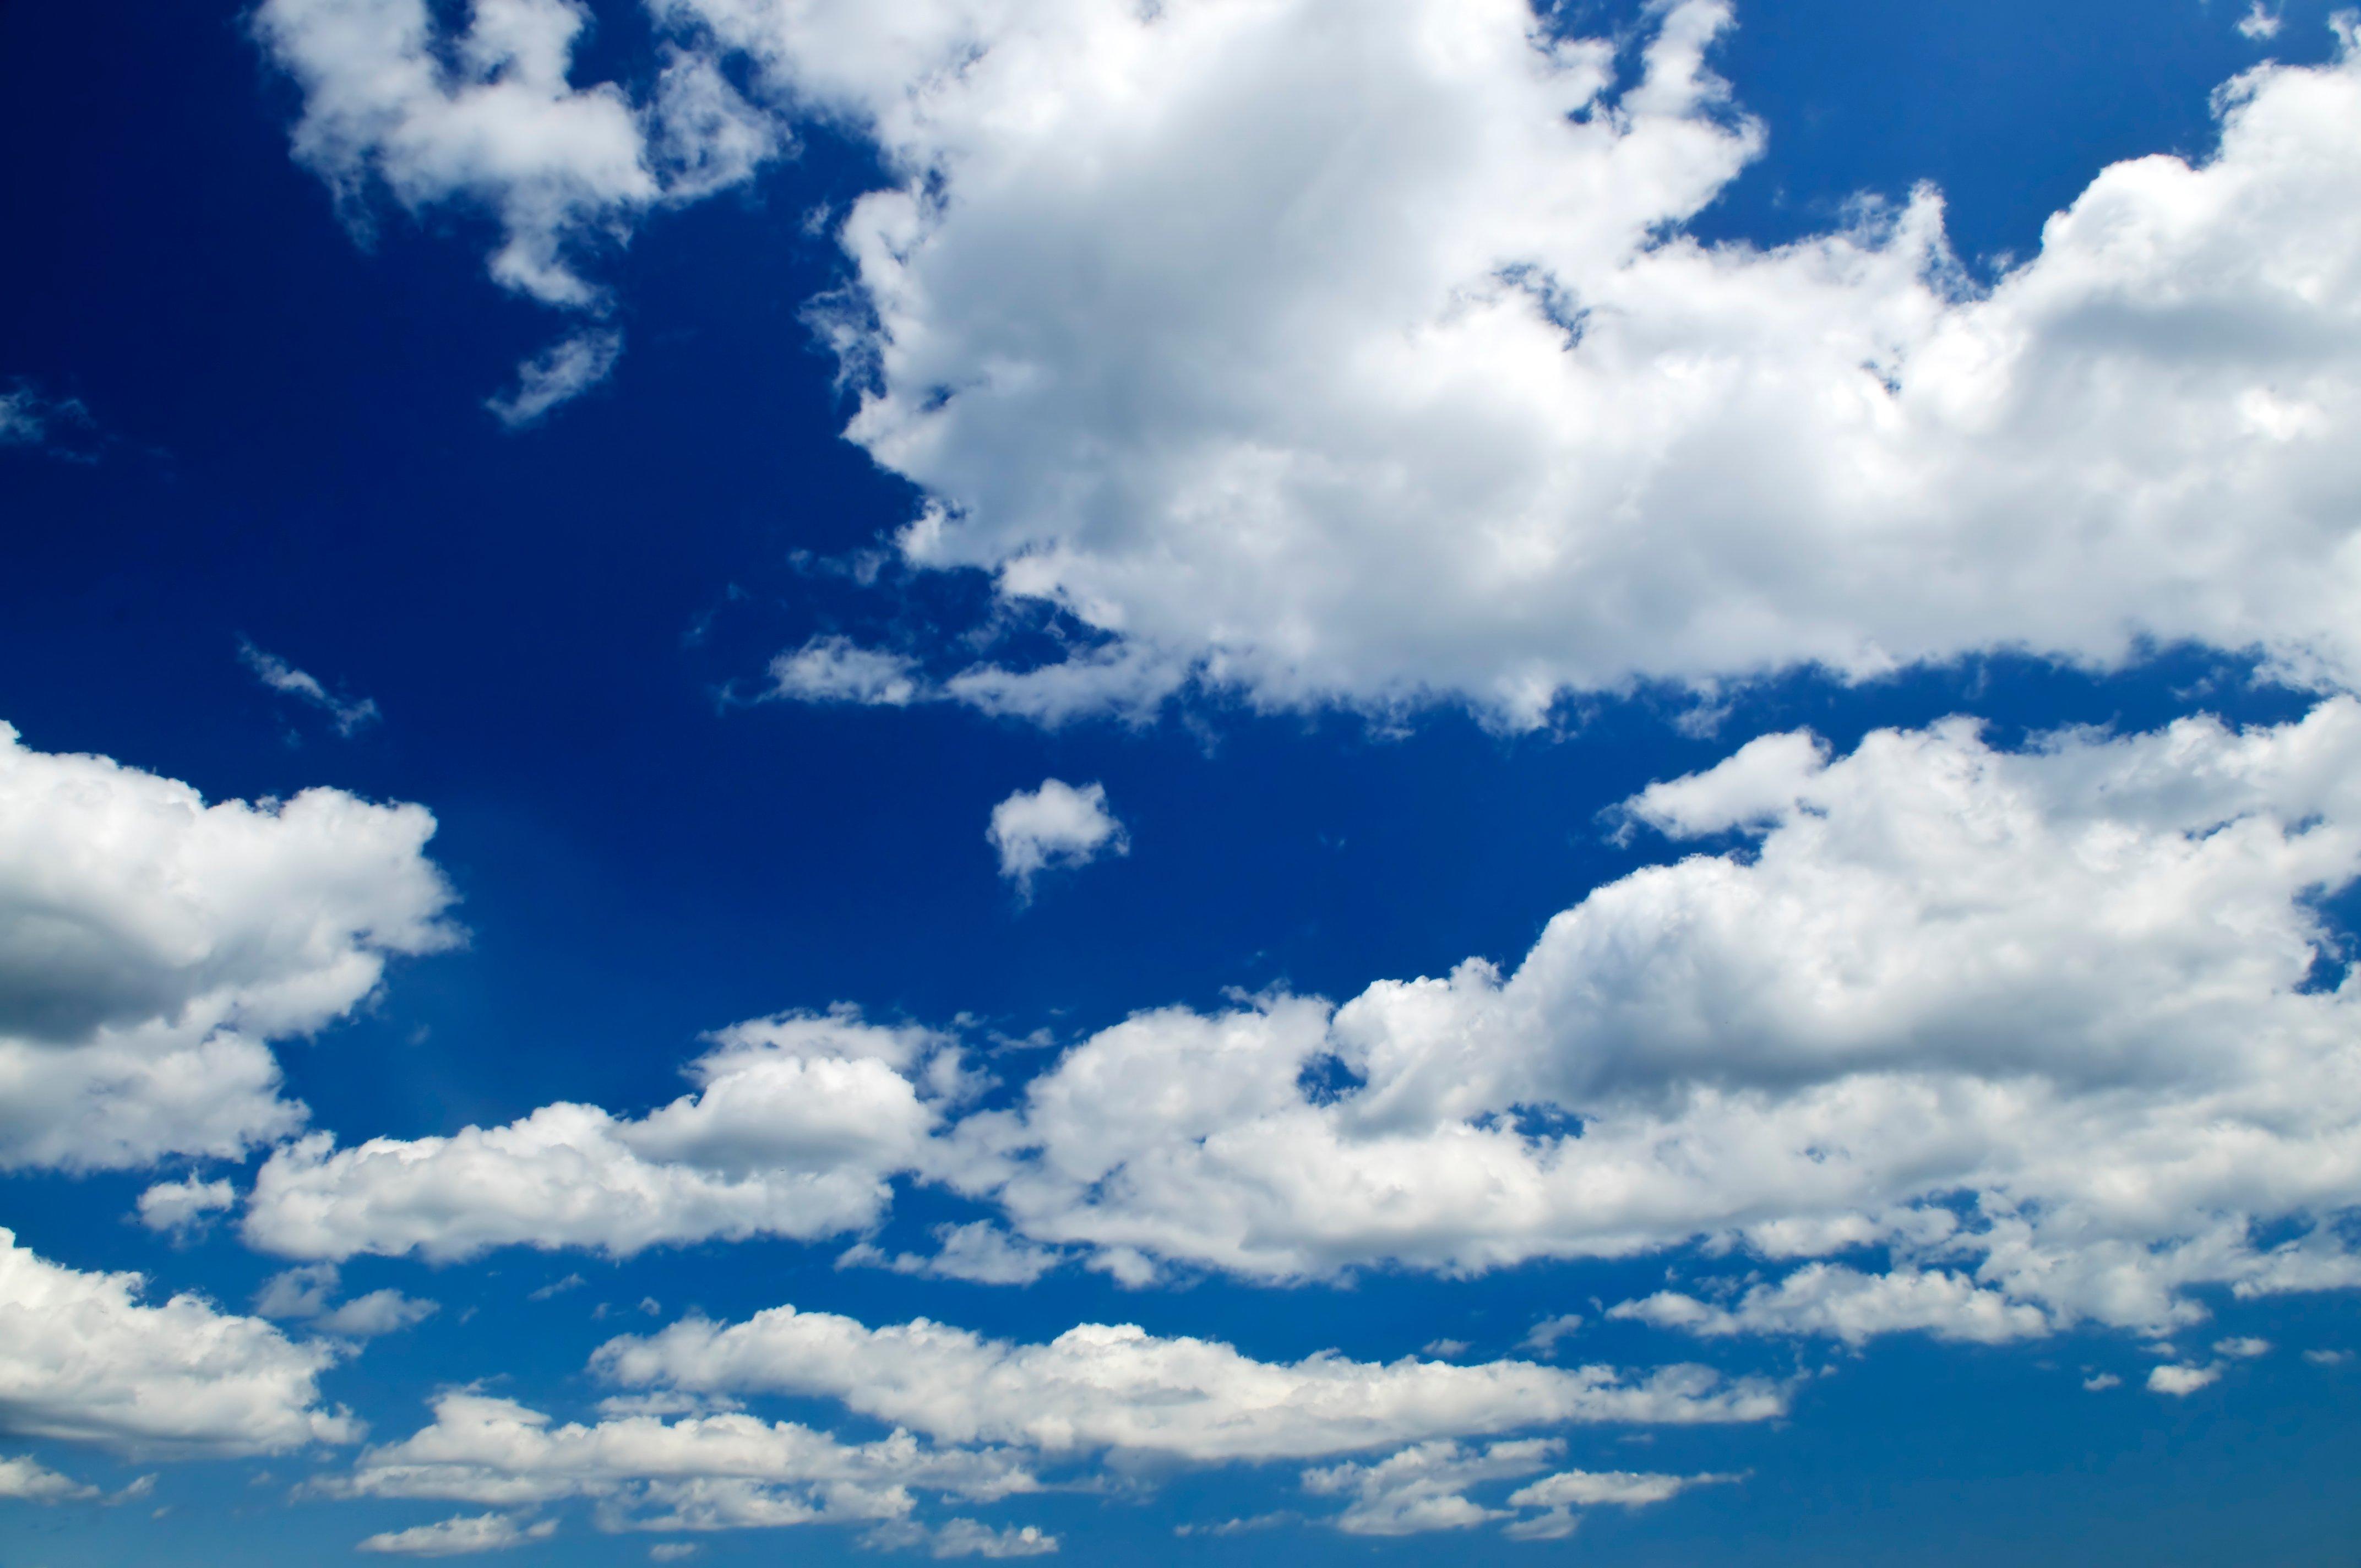 blue sky with clouds wallpaper wallpapersafari